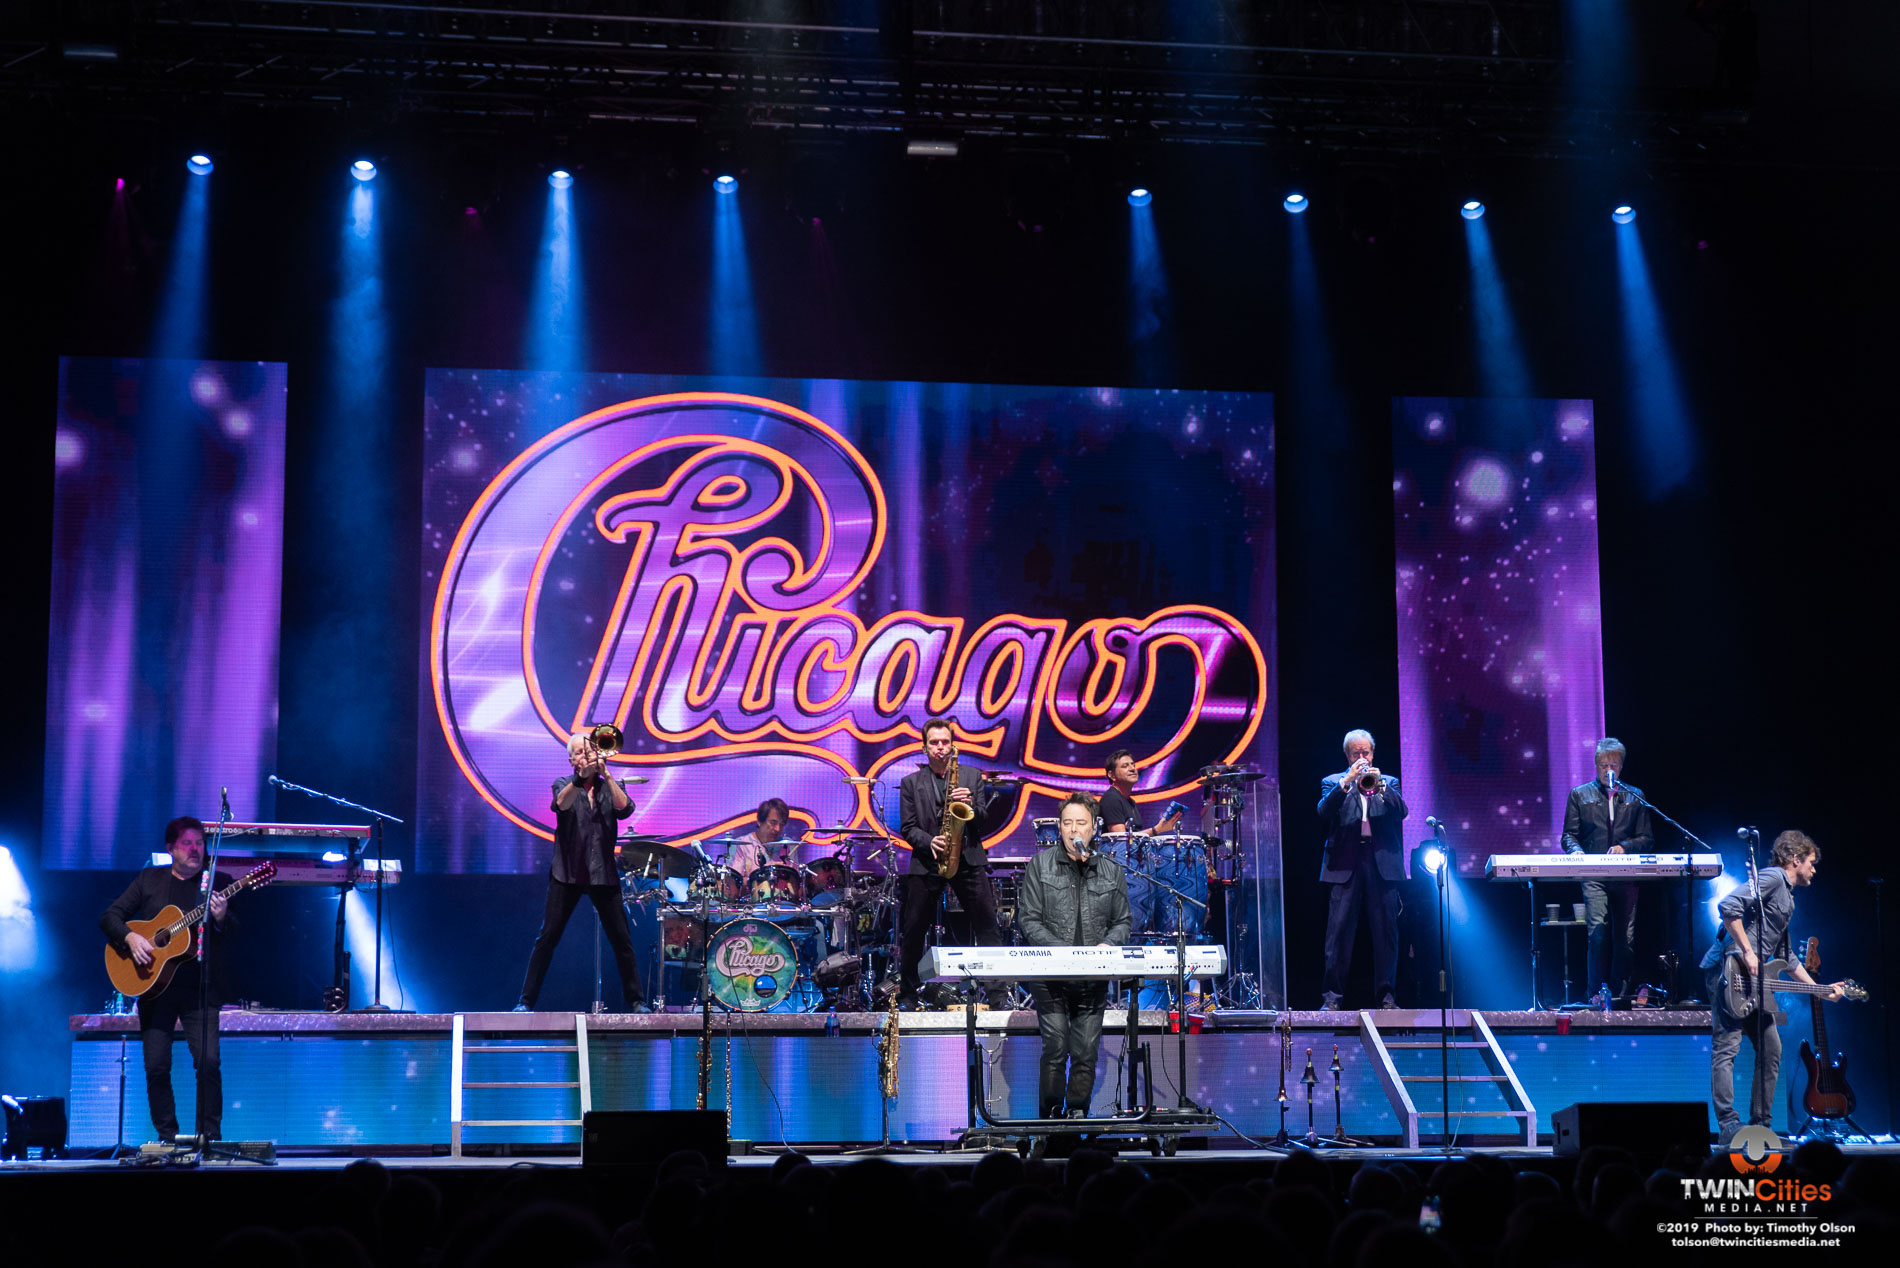 1-October-2019-TCM-Chicago-D750-Photo-8